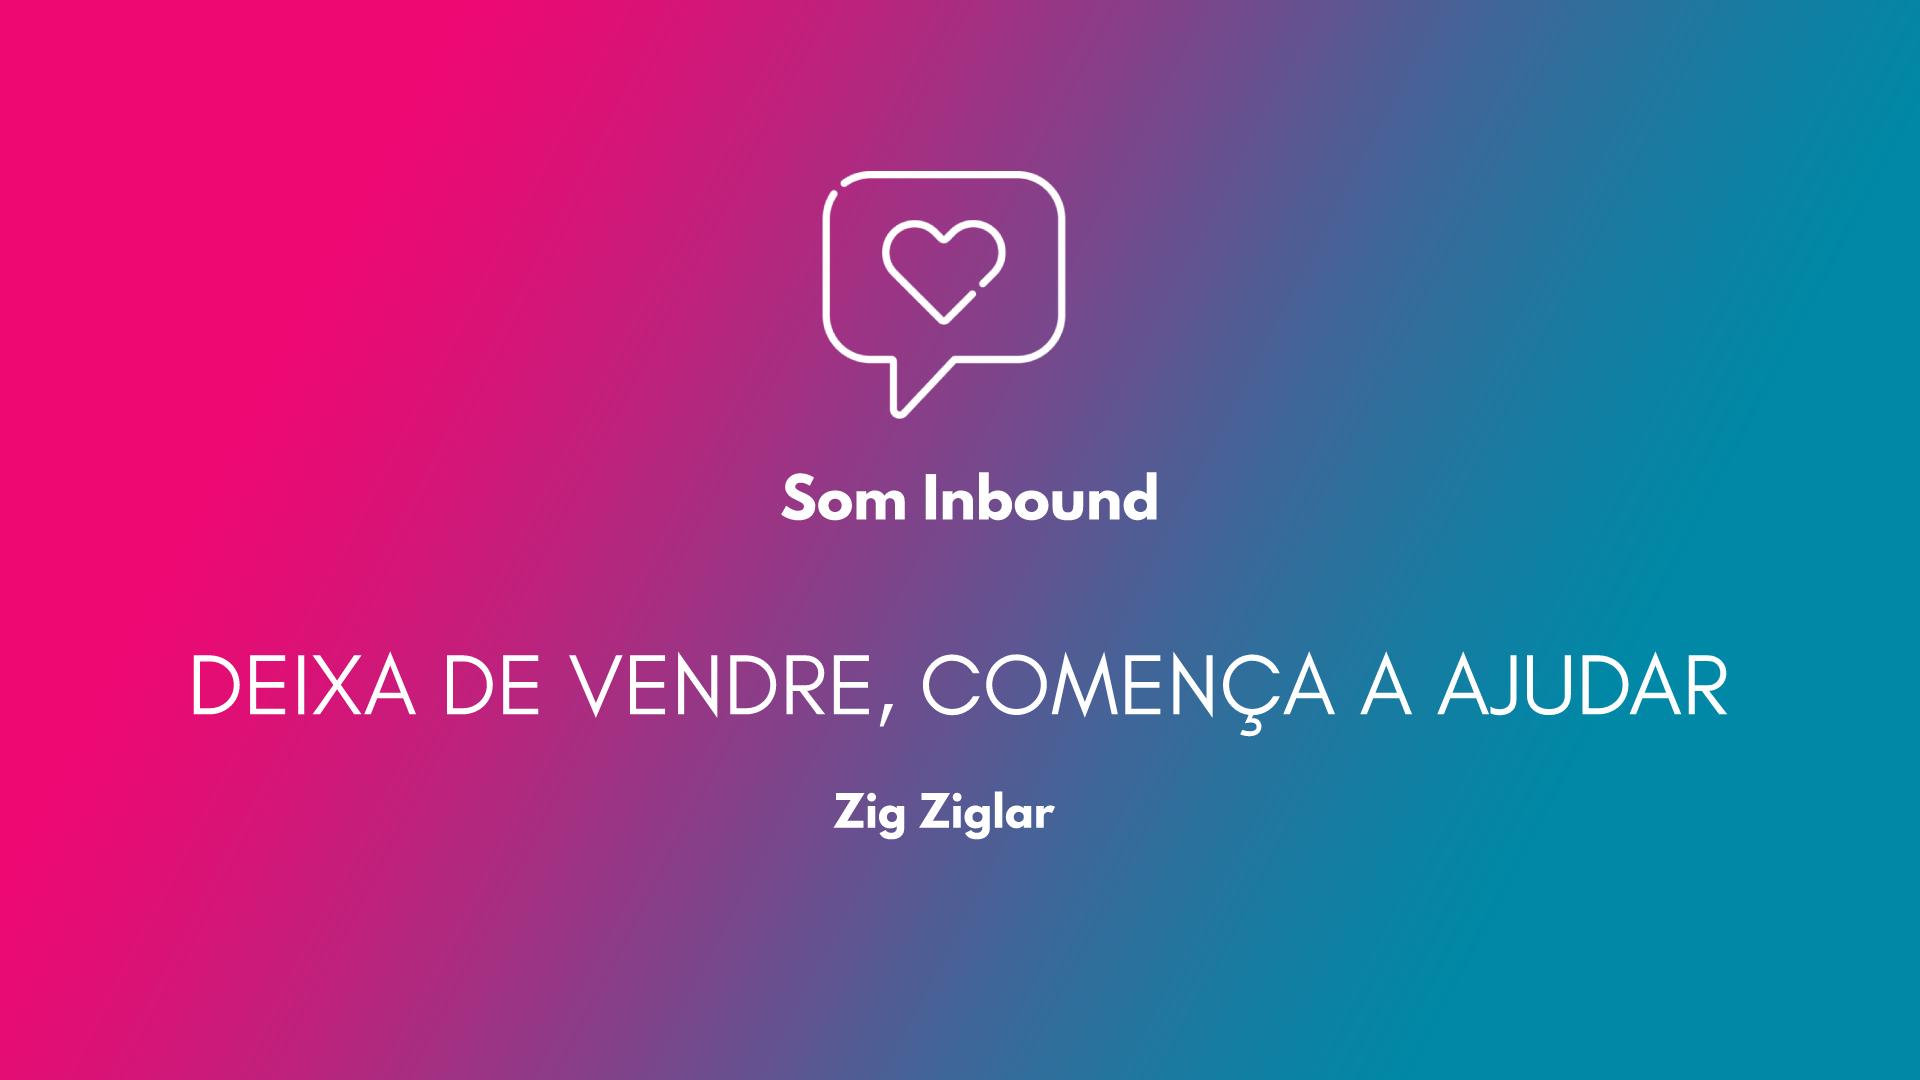 zig-ziglar-frase-catala-inbound-marketing-bizmarketing